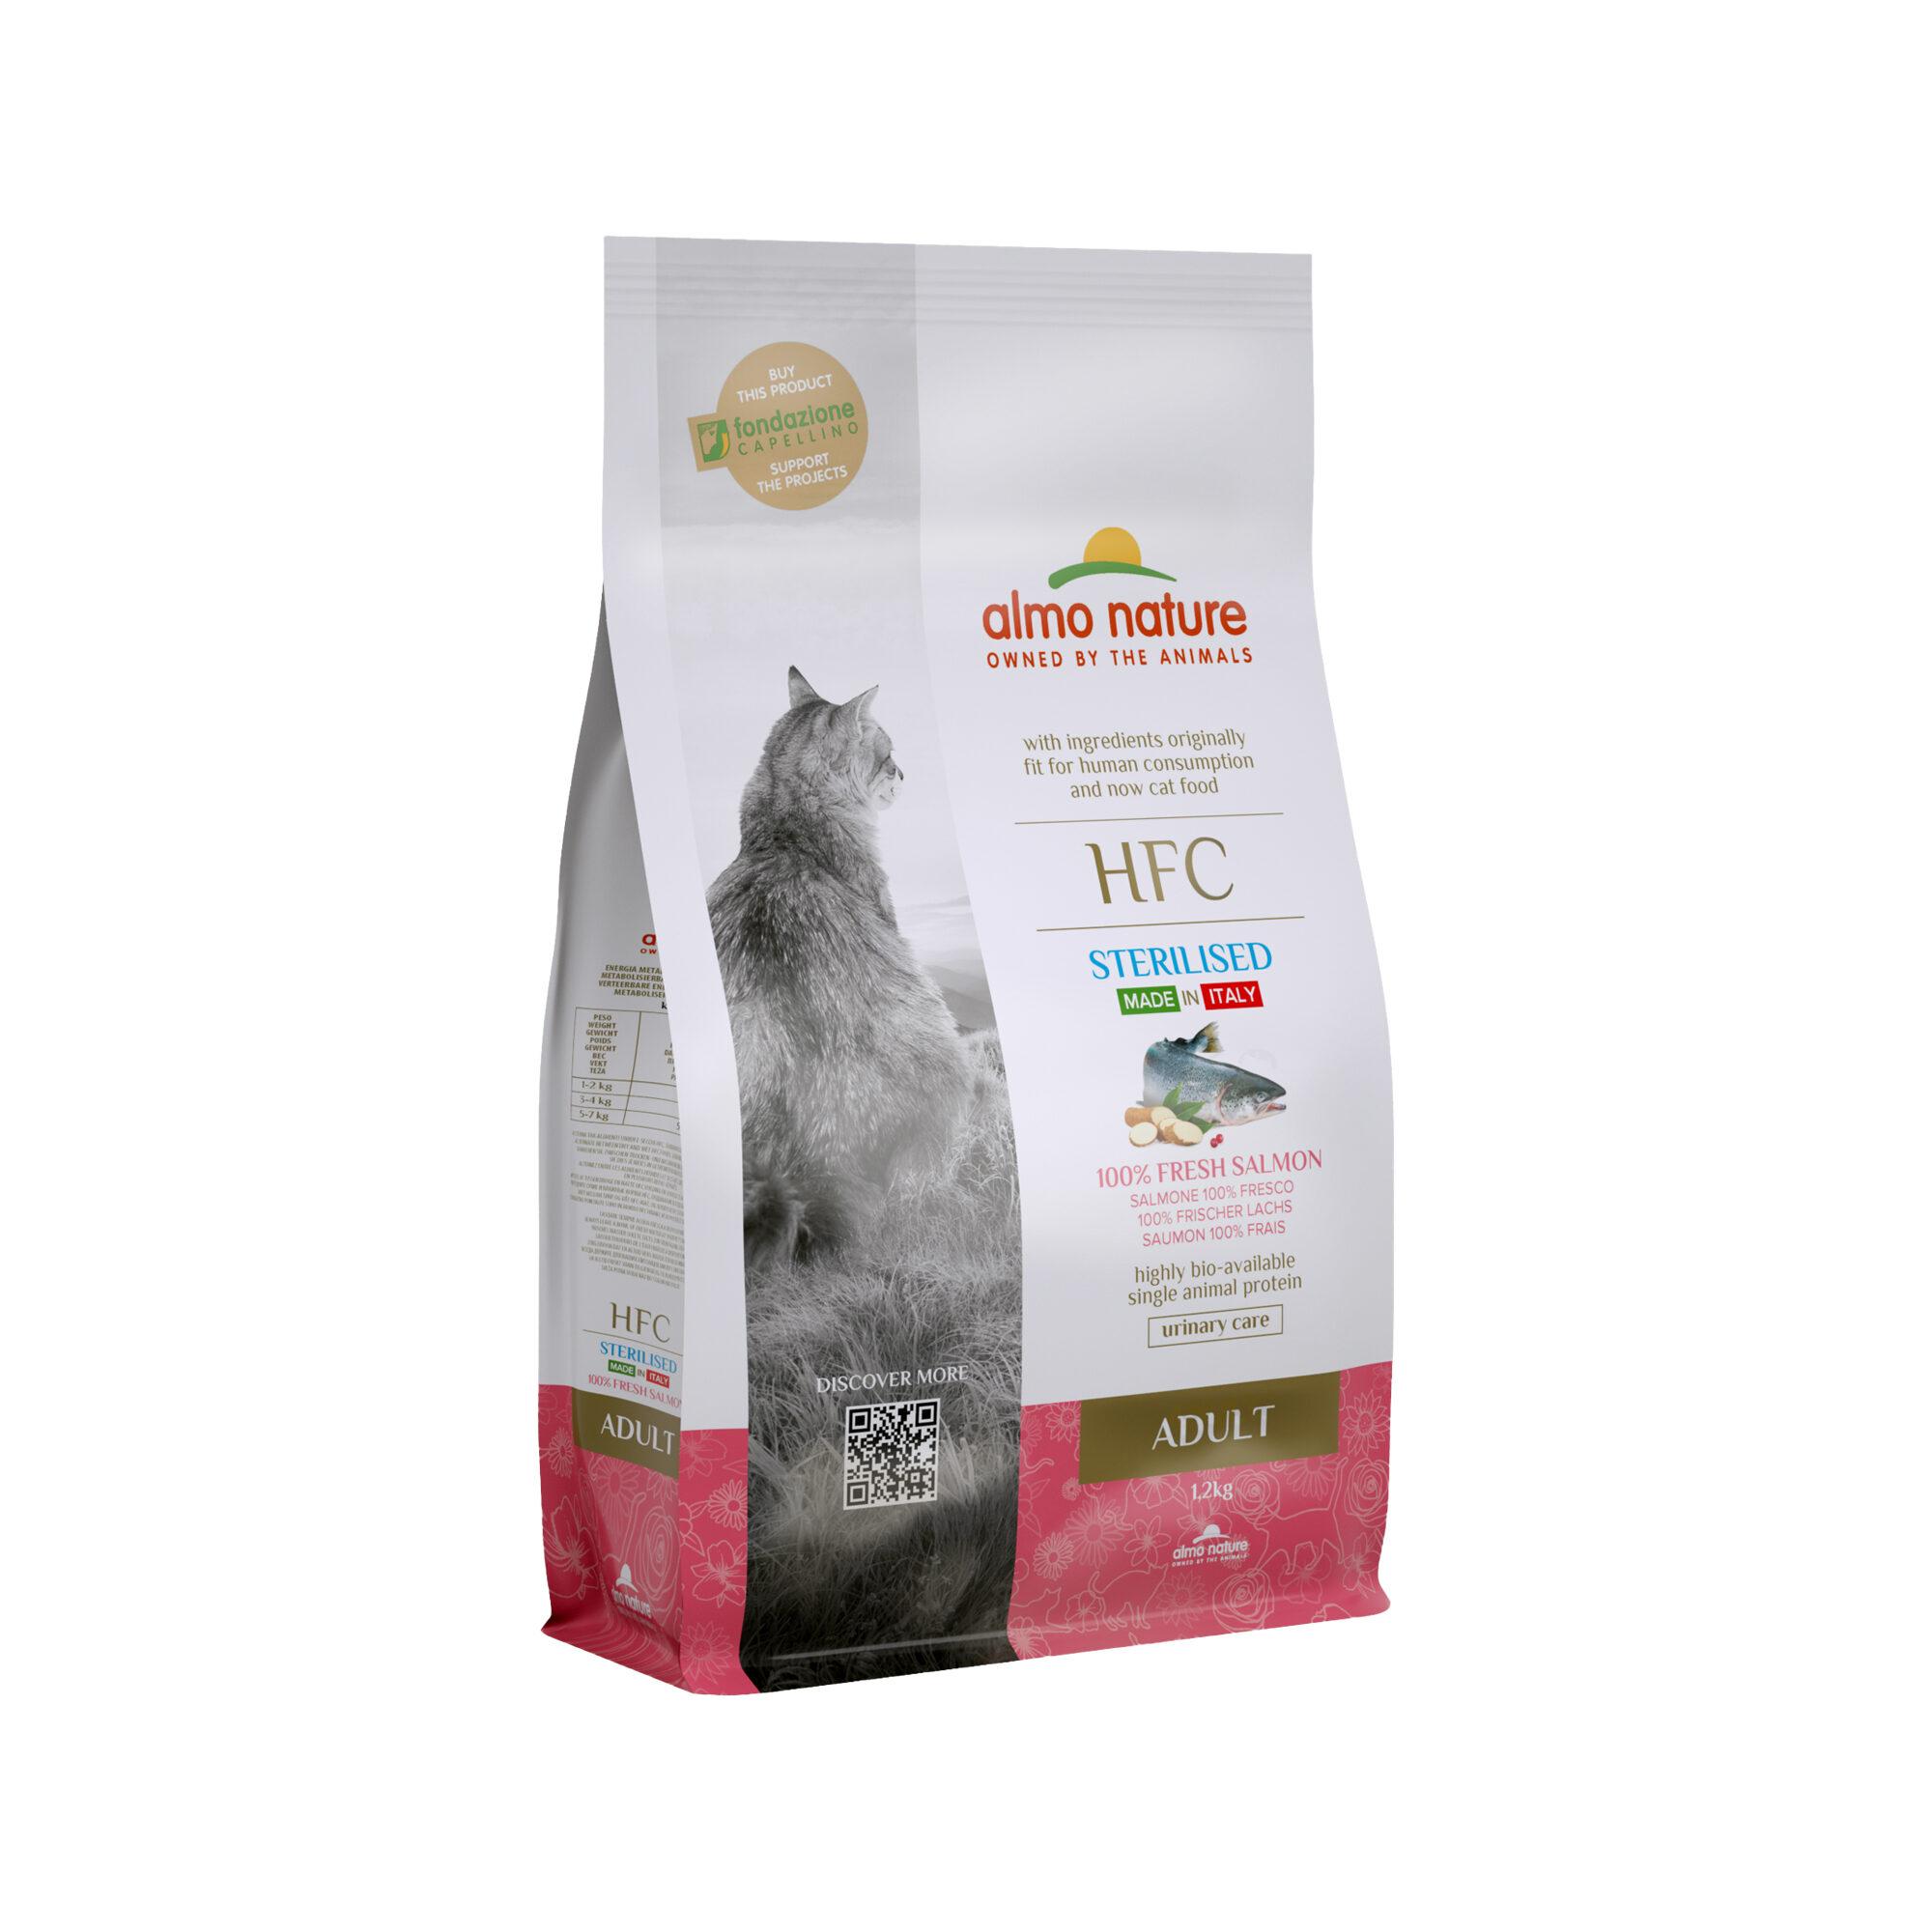 Almo Nature HFC Adult Sterilised Katzenfutter - Lachs - 1,2 kg